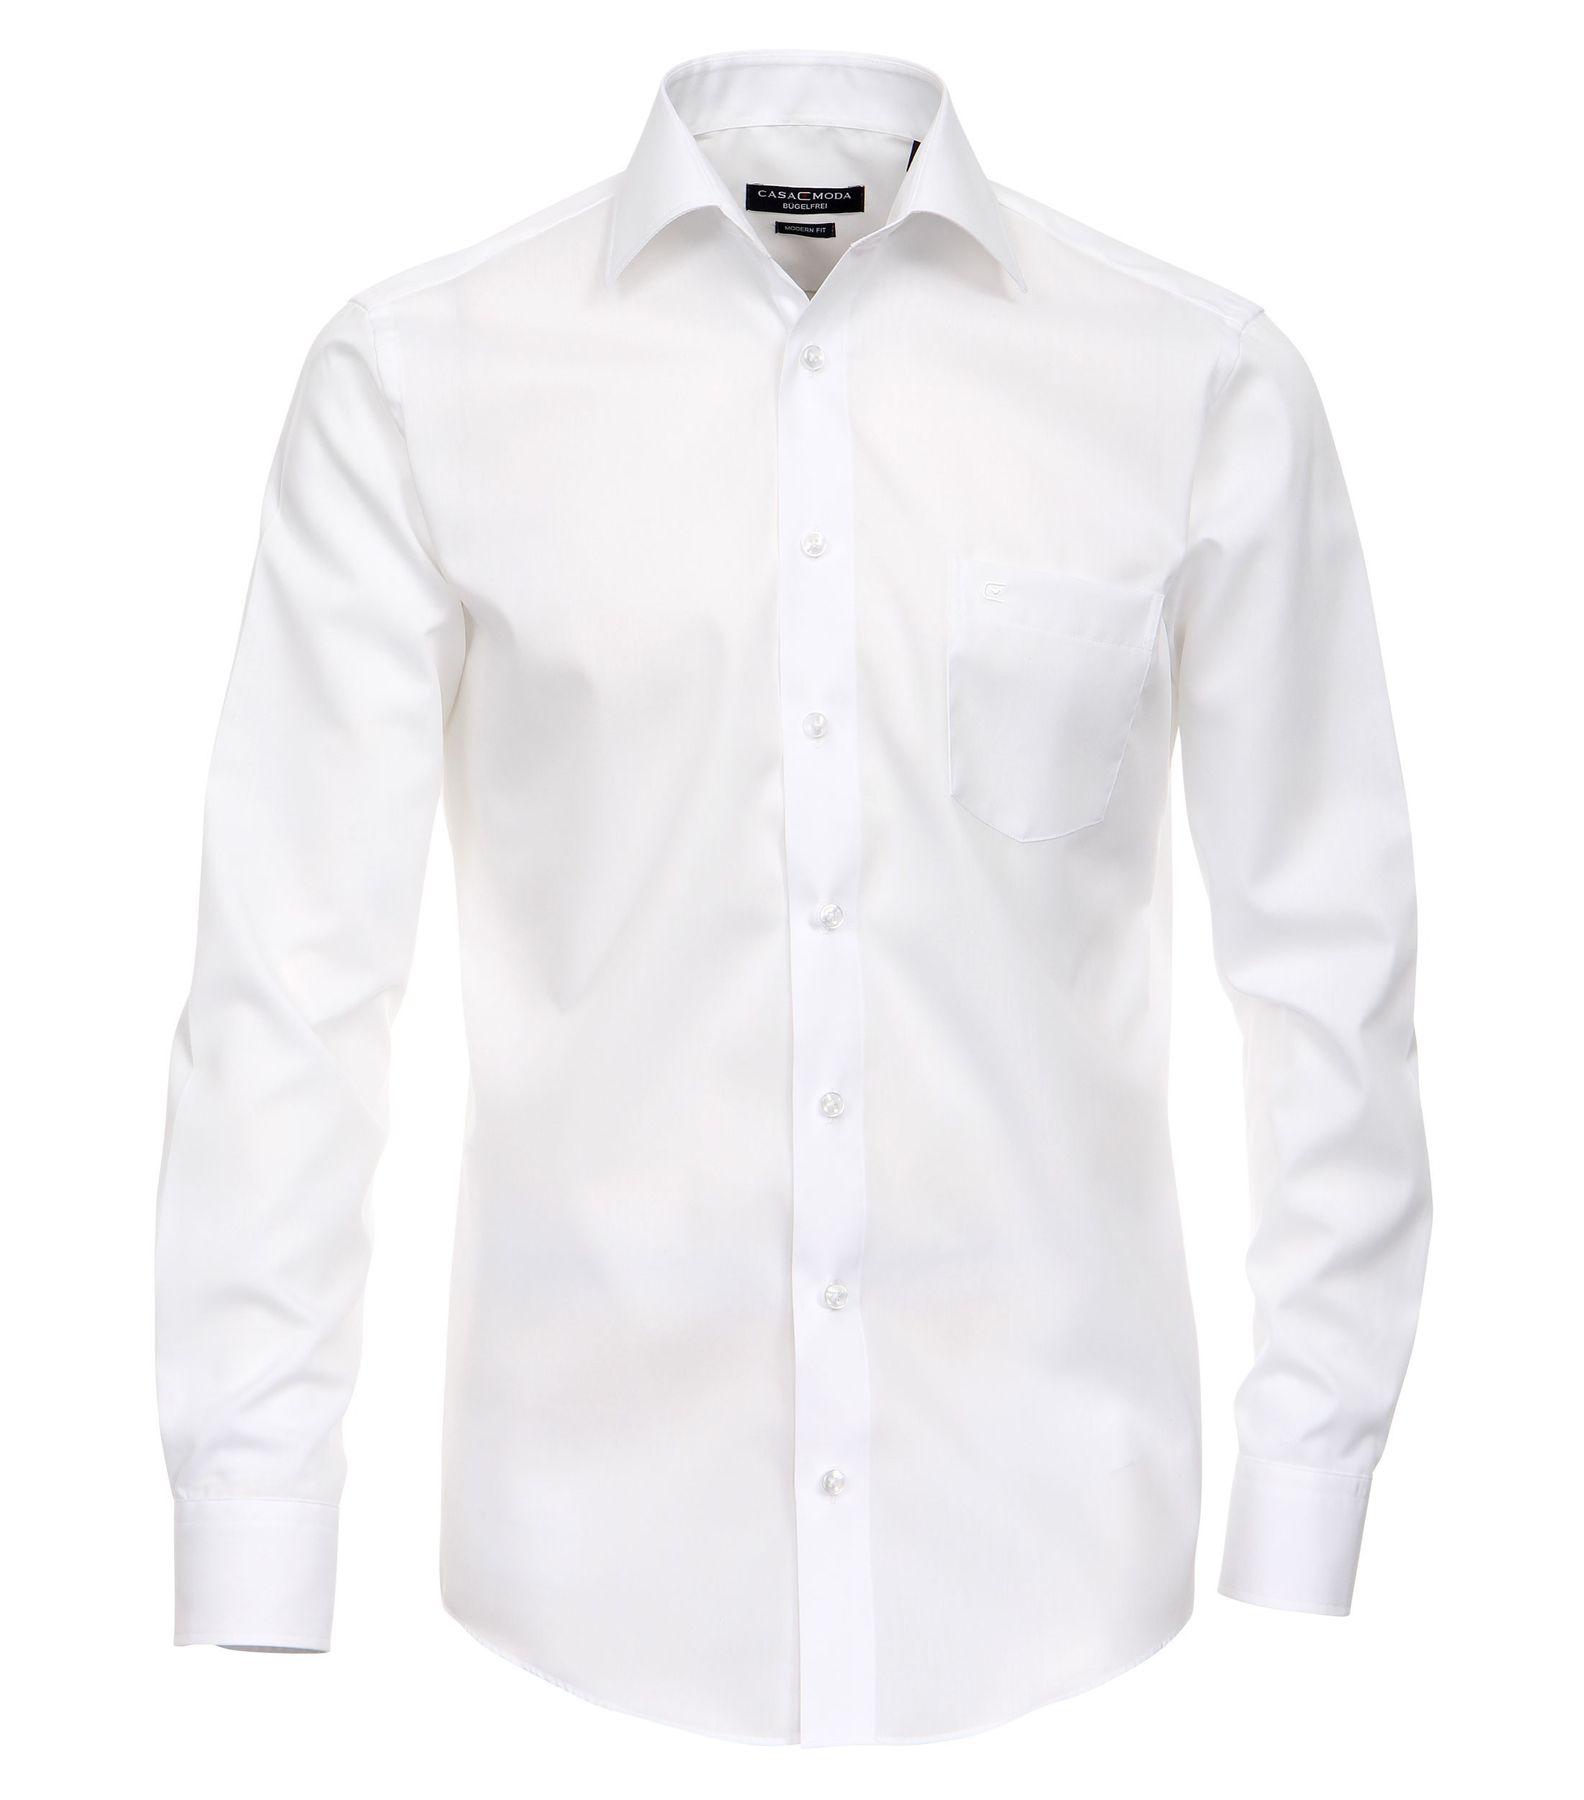 Casamoda - Modern Fit - Bügelfreies Herren Business Langarm Hemd verschiedene Farben (006560A) – Bild 5